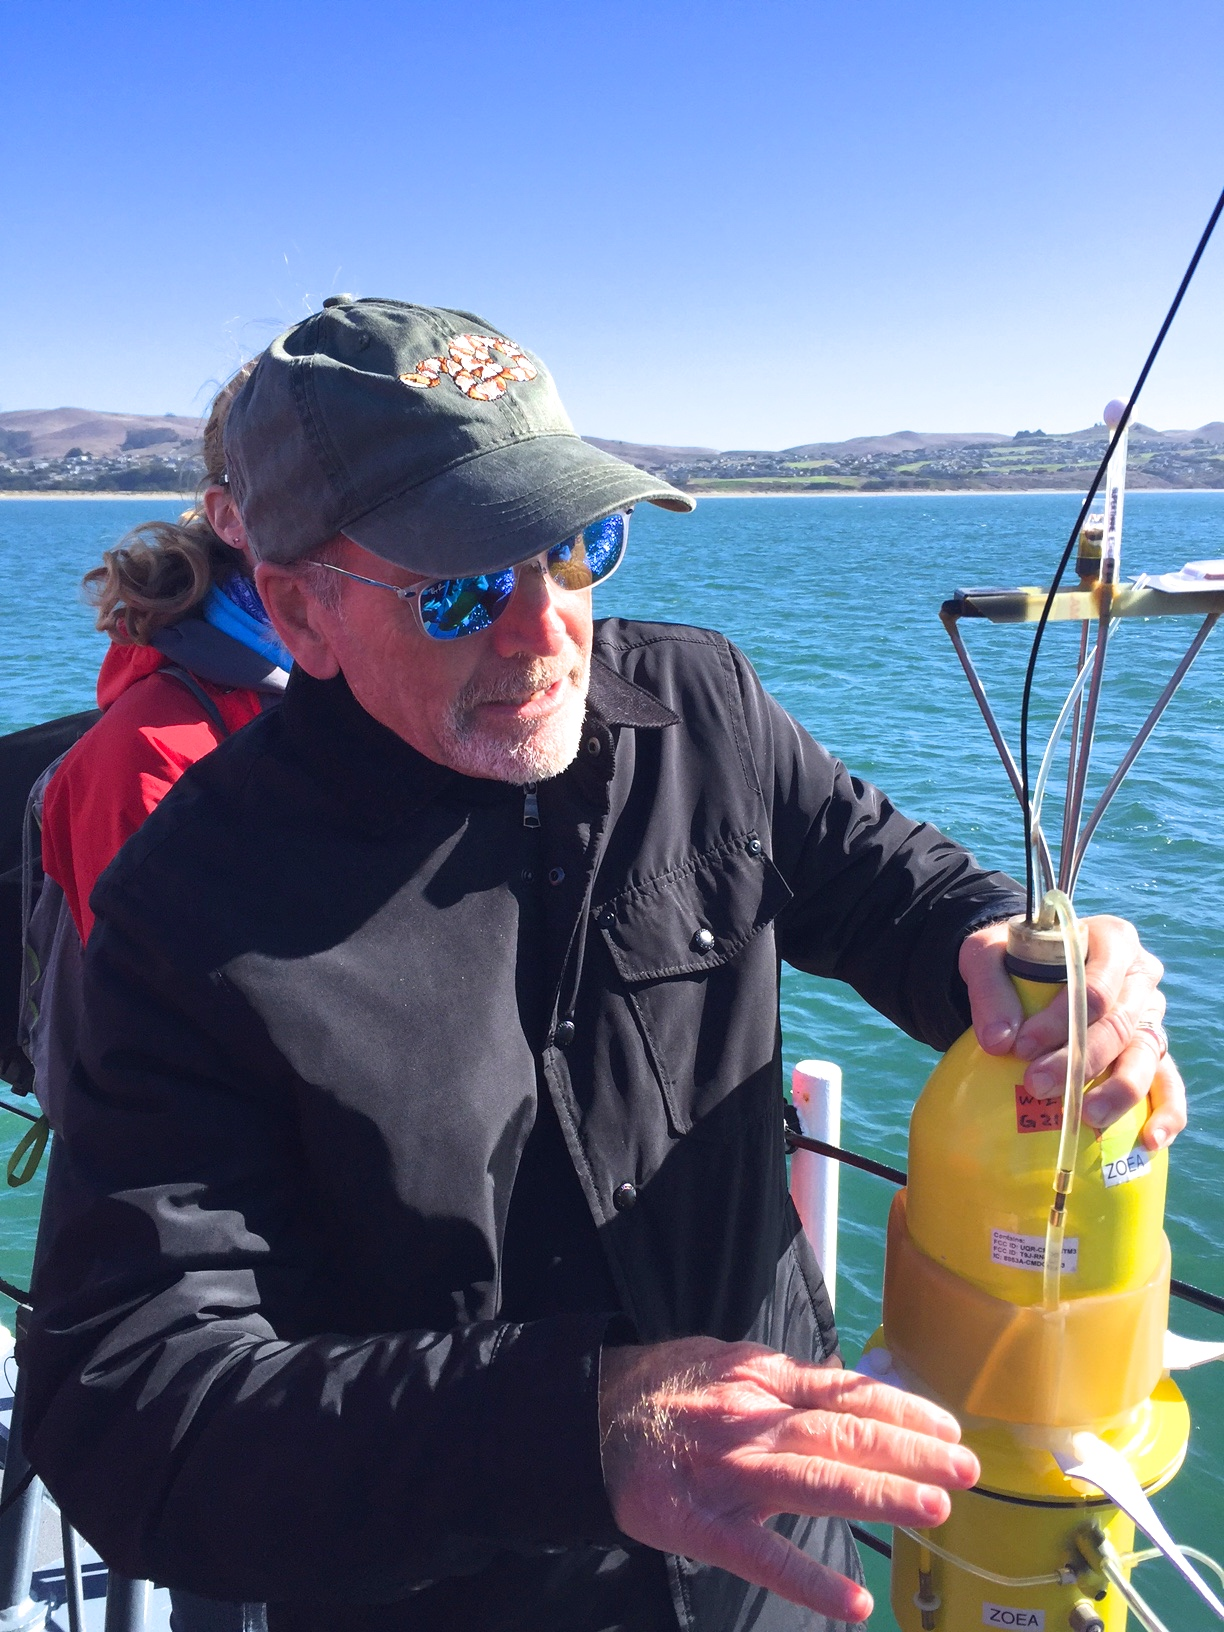 Steven Morgan with seabot